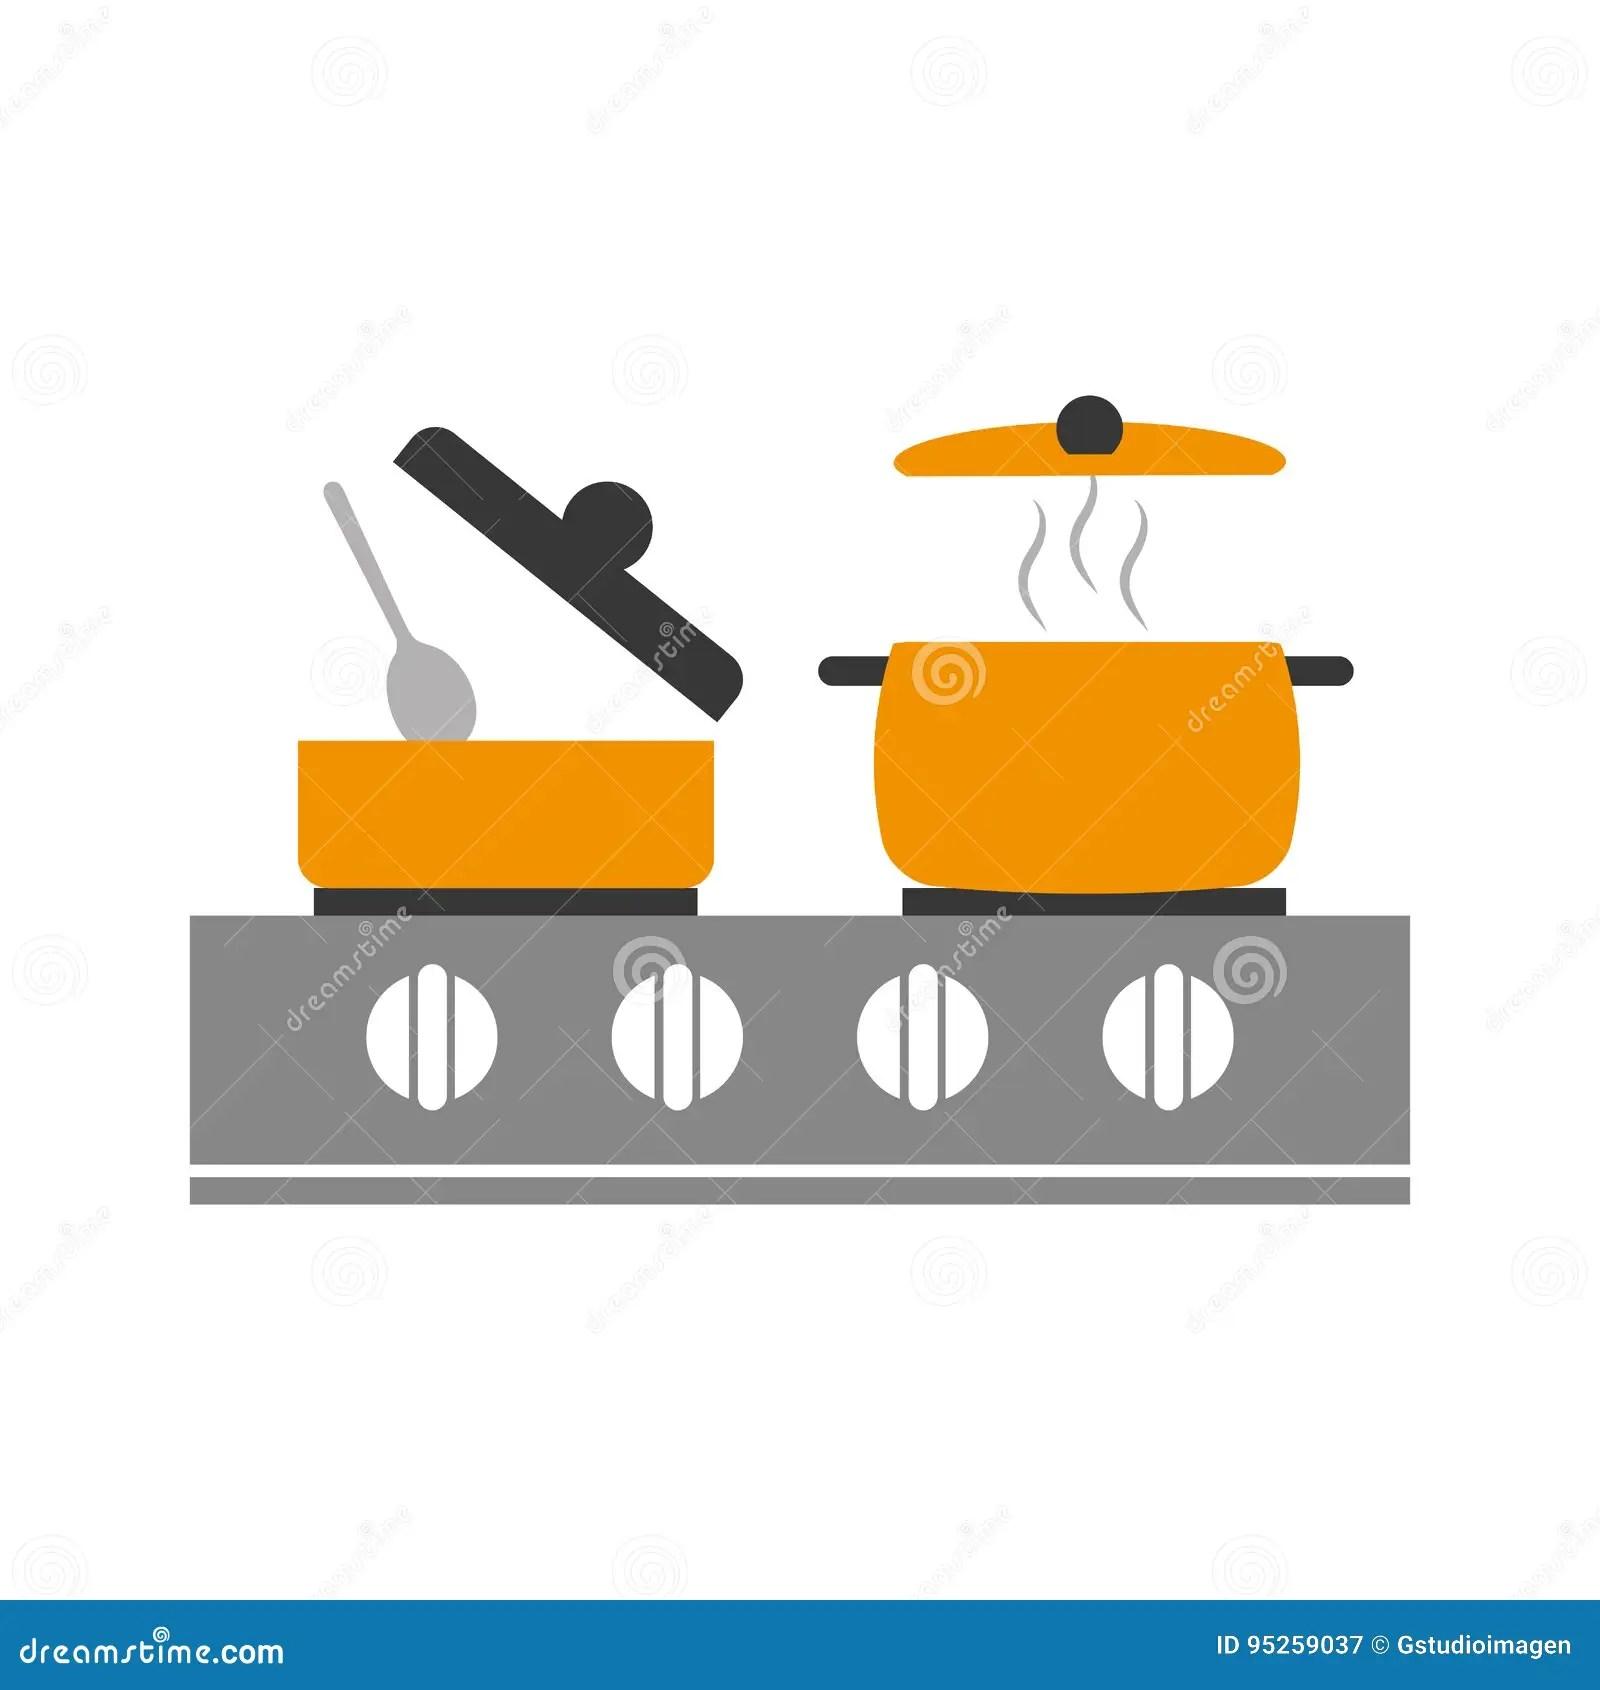 kitchen canister buy metal cabinets 有火炉的厨房罐向量例证 插画包括有图象 国内 餐馆 烹饪 棍子 正餐 有火炉传染媒介例证设计的厨房罐